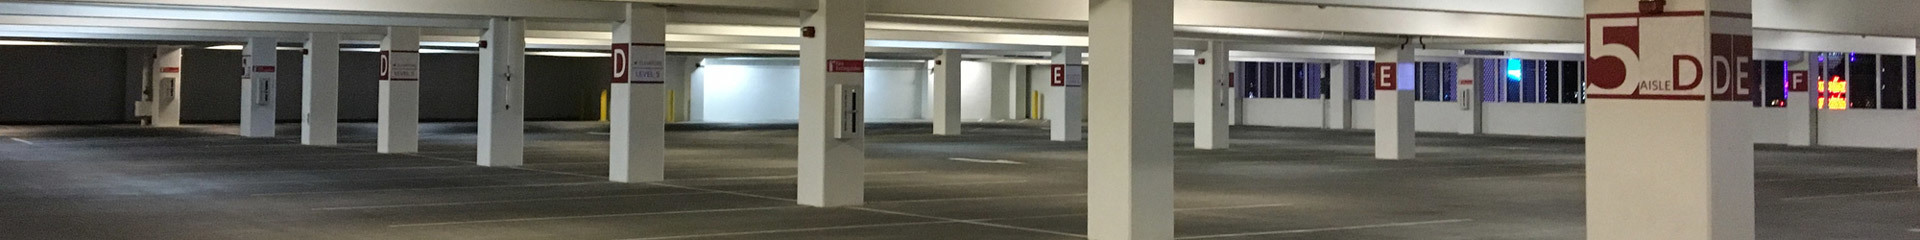 Parking Decks, Garages & Lots